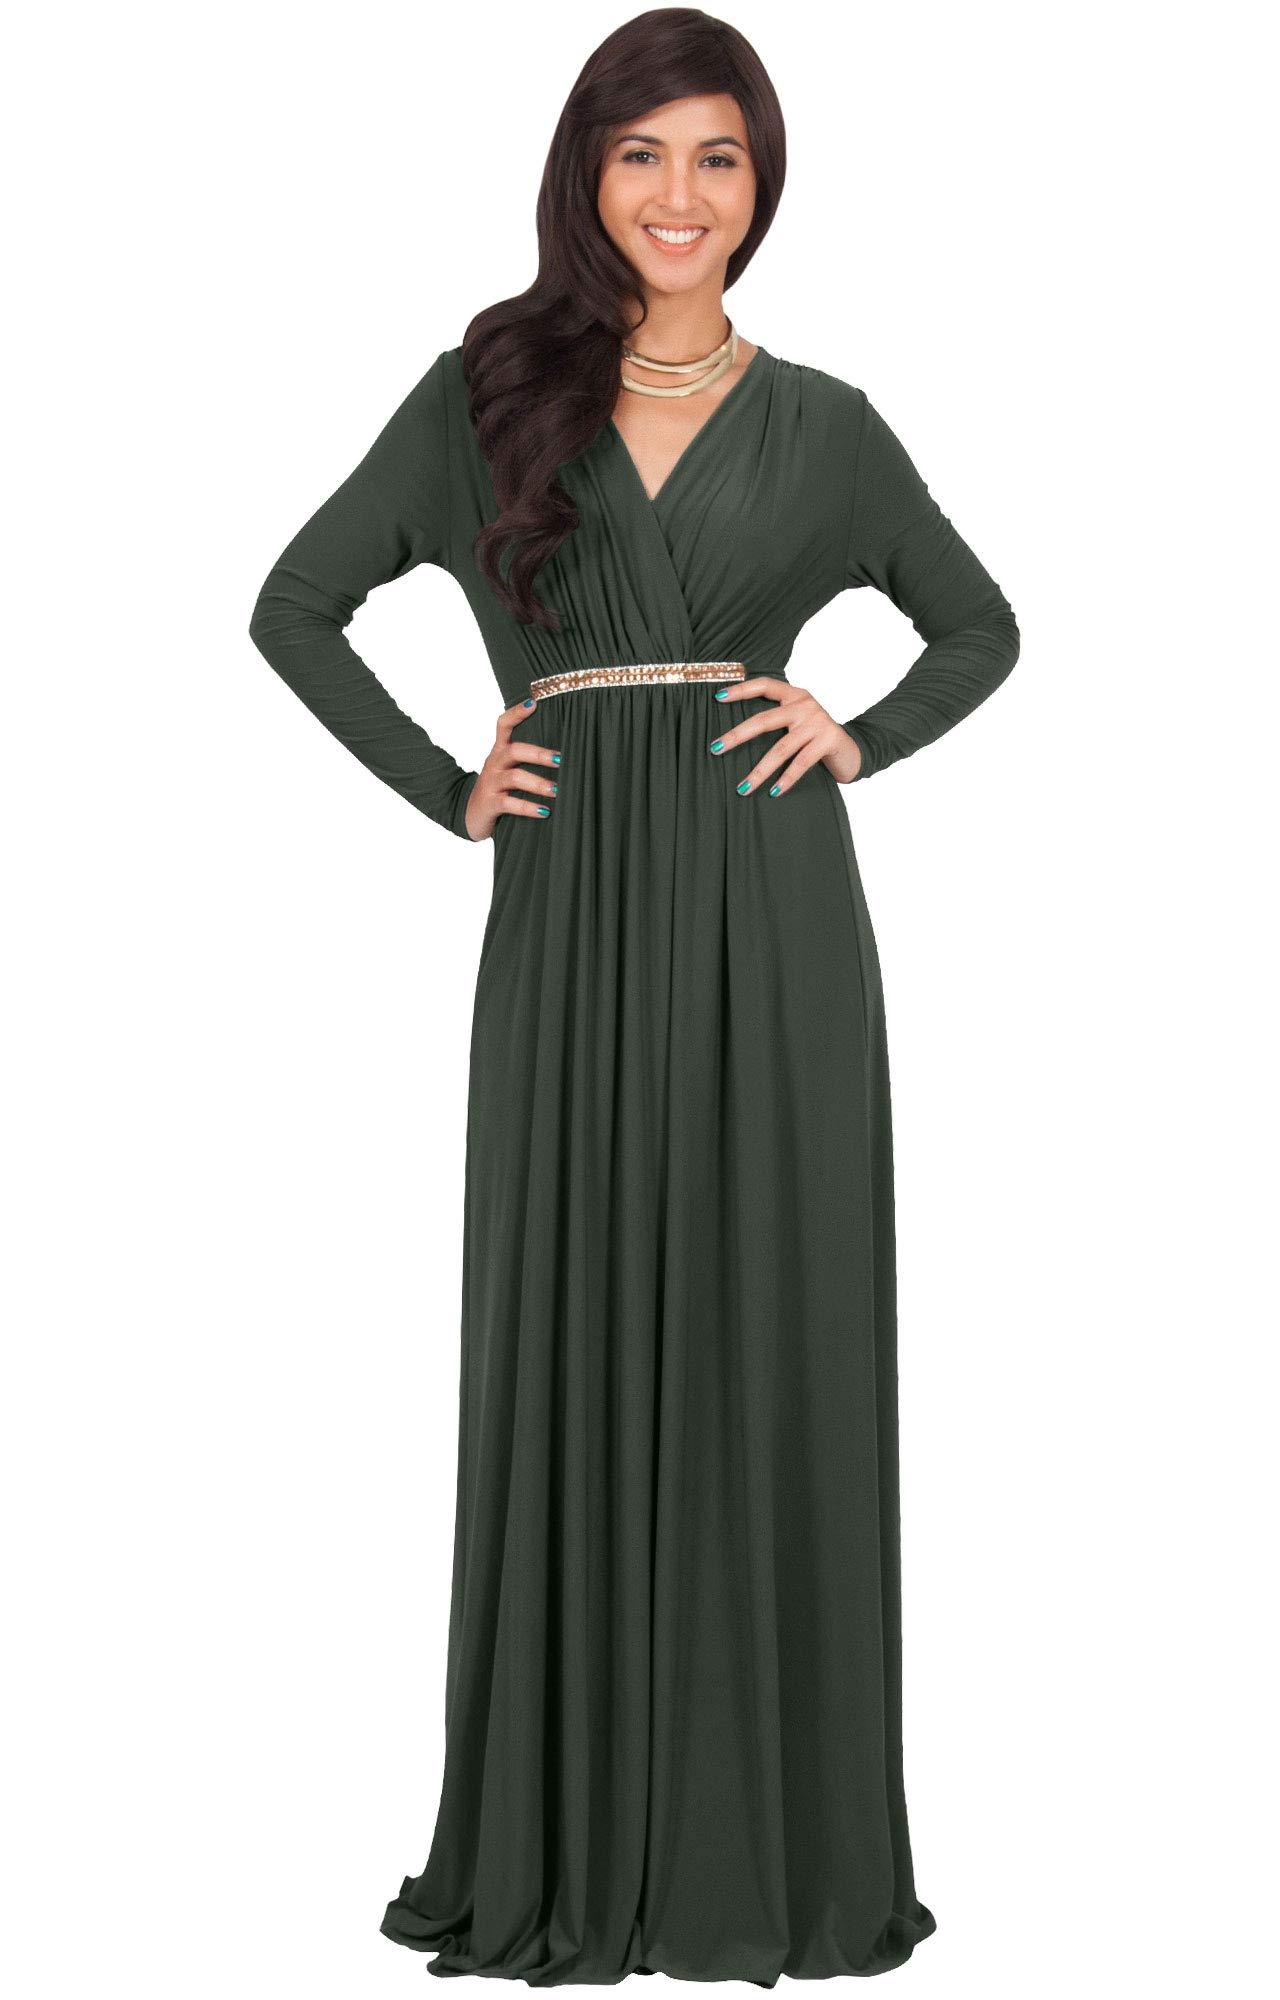 31c6f70c6dc KOH KOH Petite Womens Long Sleeve Sleeves Kaftan V-Neck Flowy Formal Wedding  Guest Fall Winter Evening Day Empire Waist Abaya Muslim Gown Gowns Maxi  Dress ...